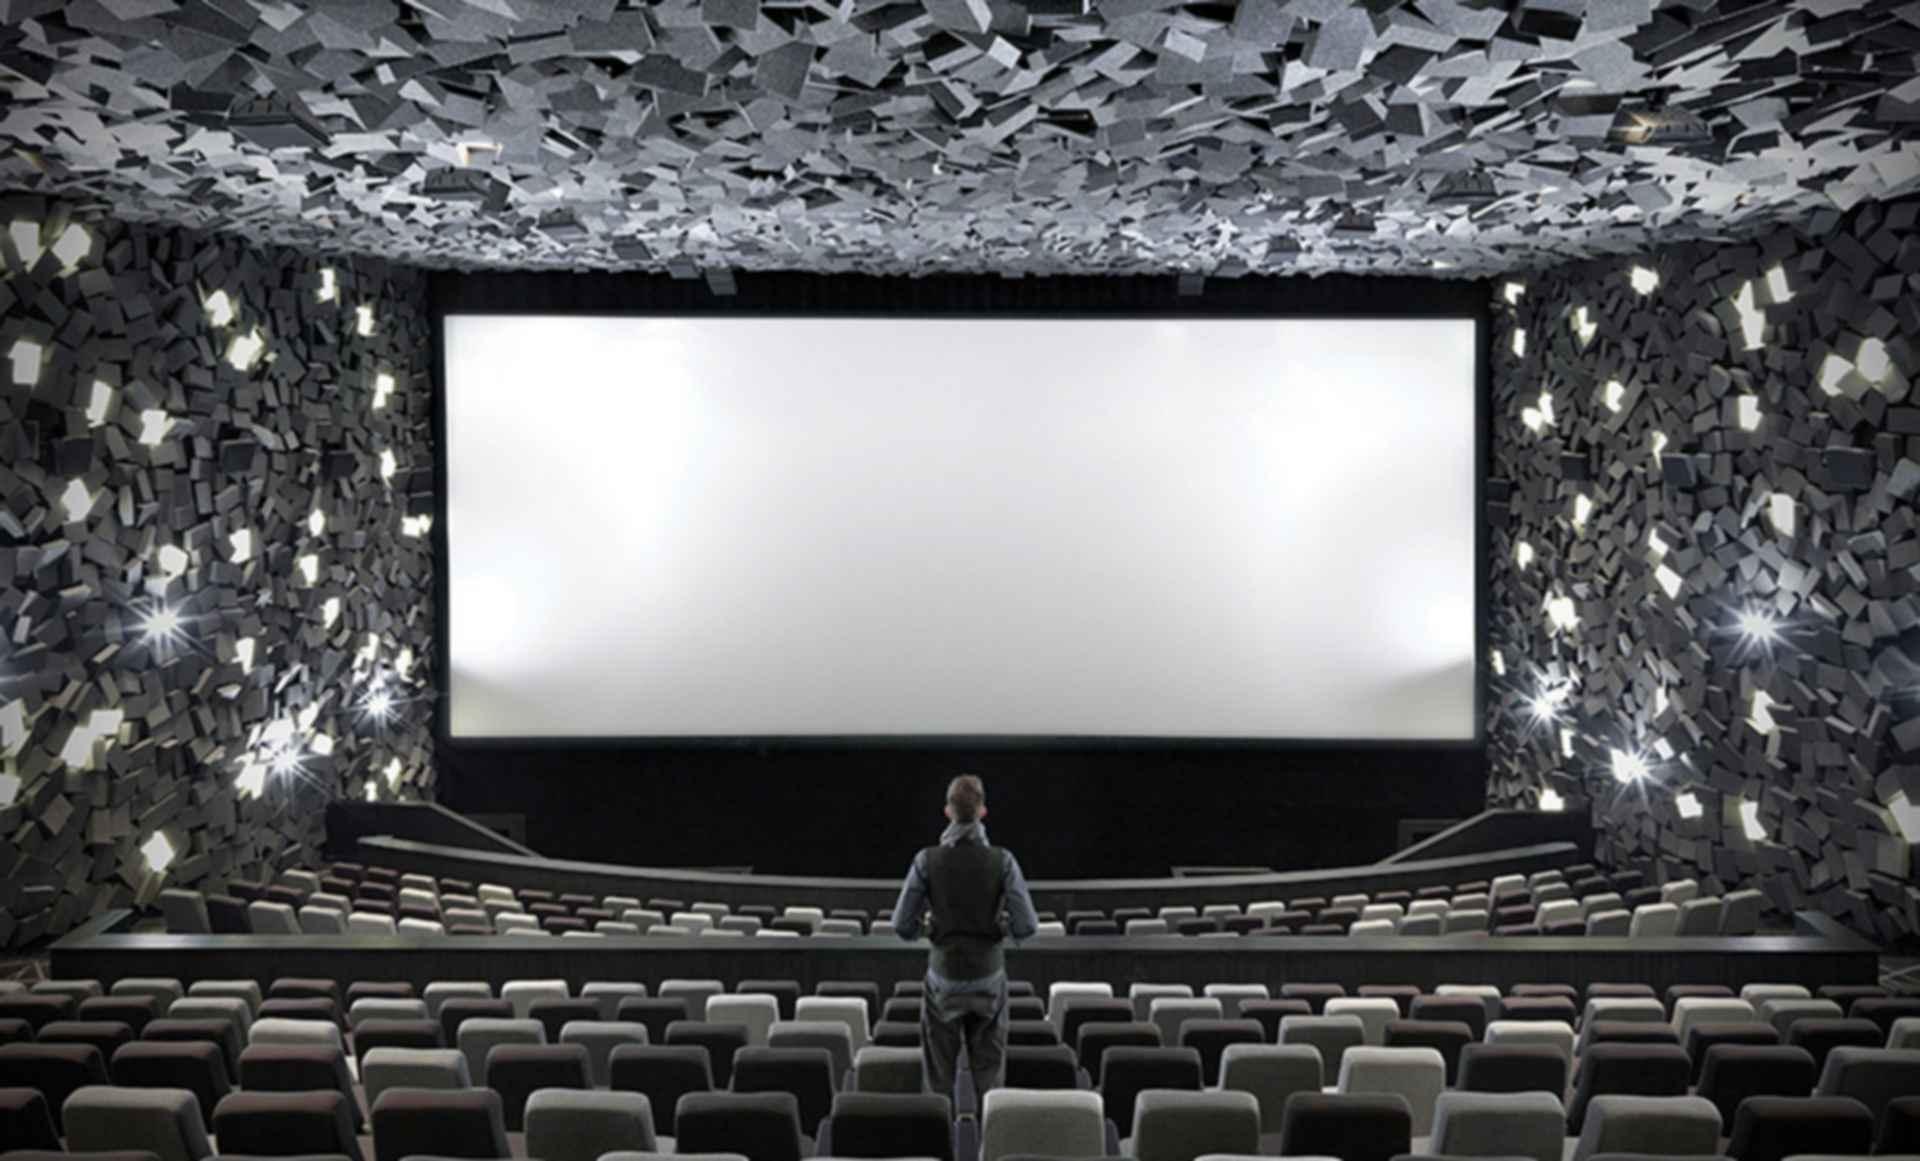 Exploded Cinema - concept design